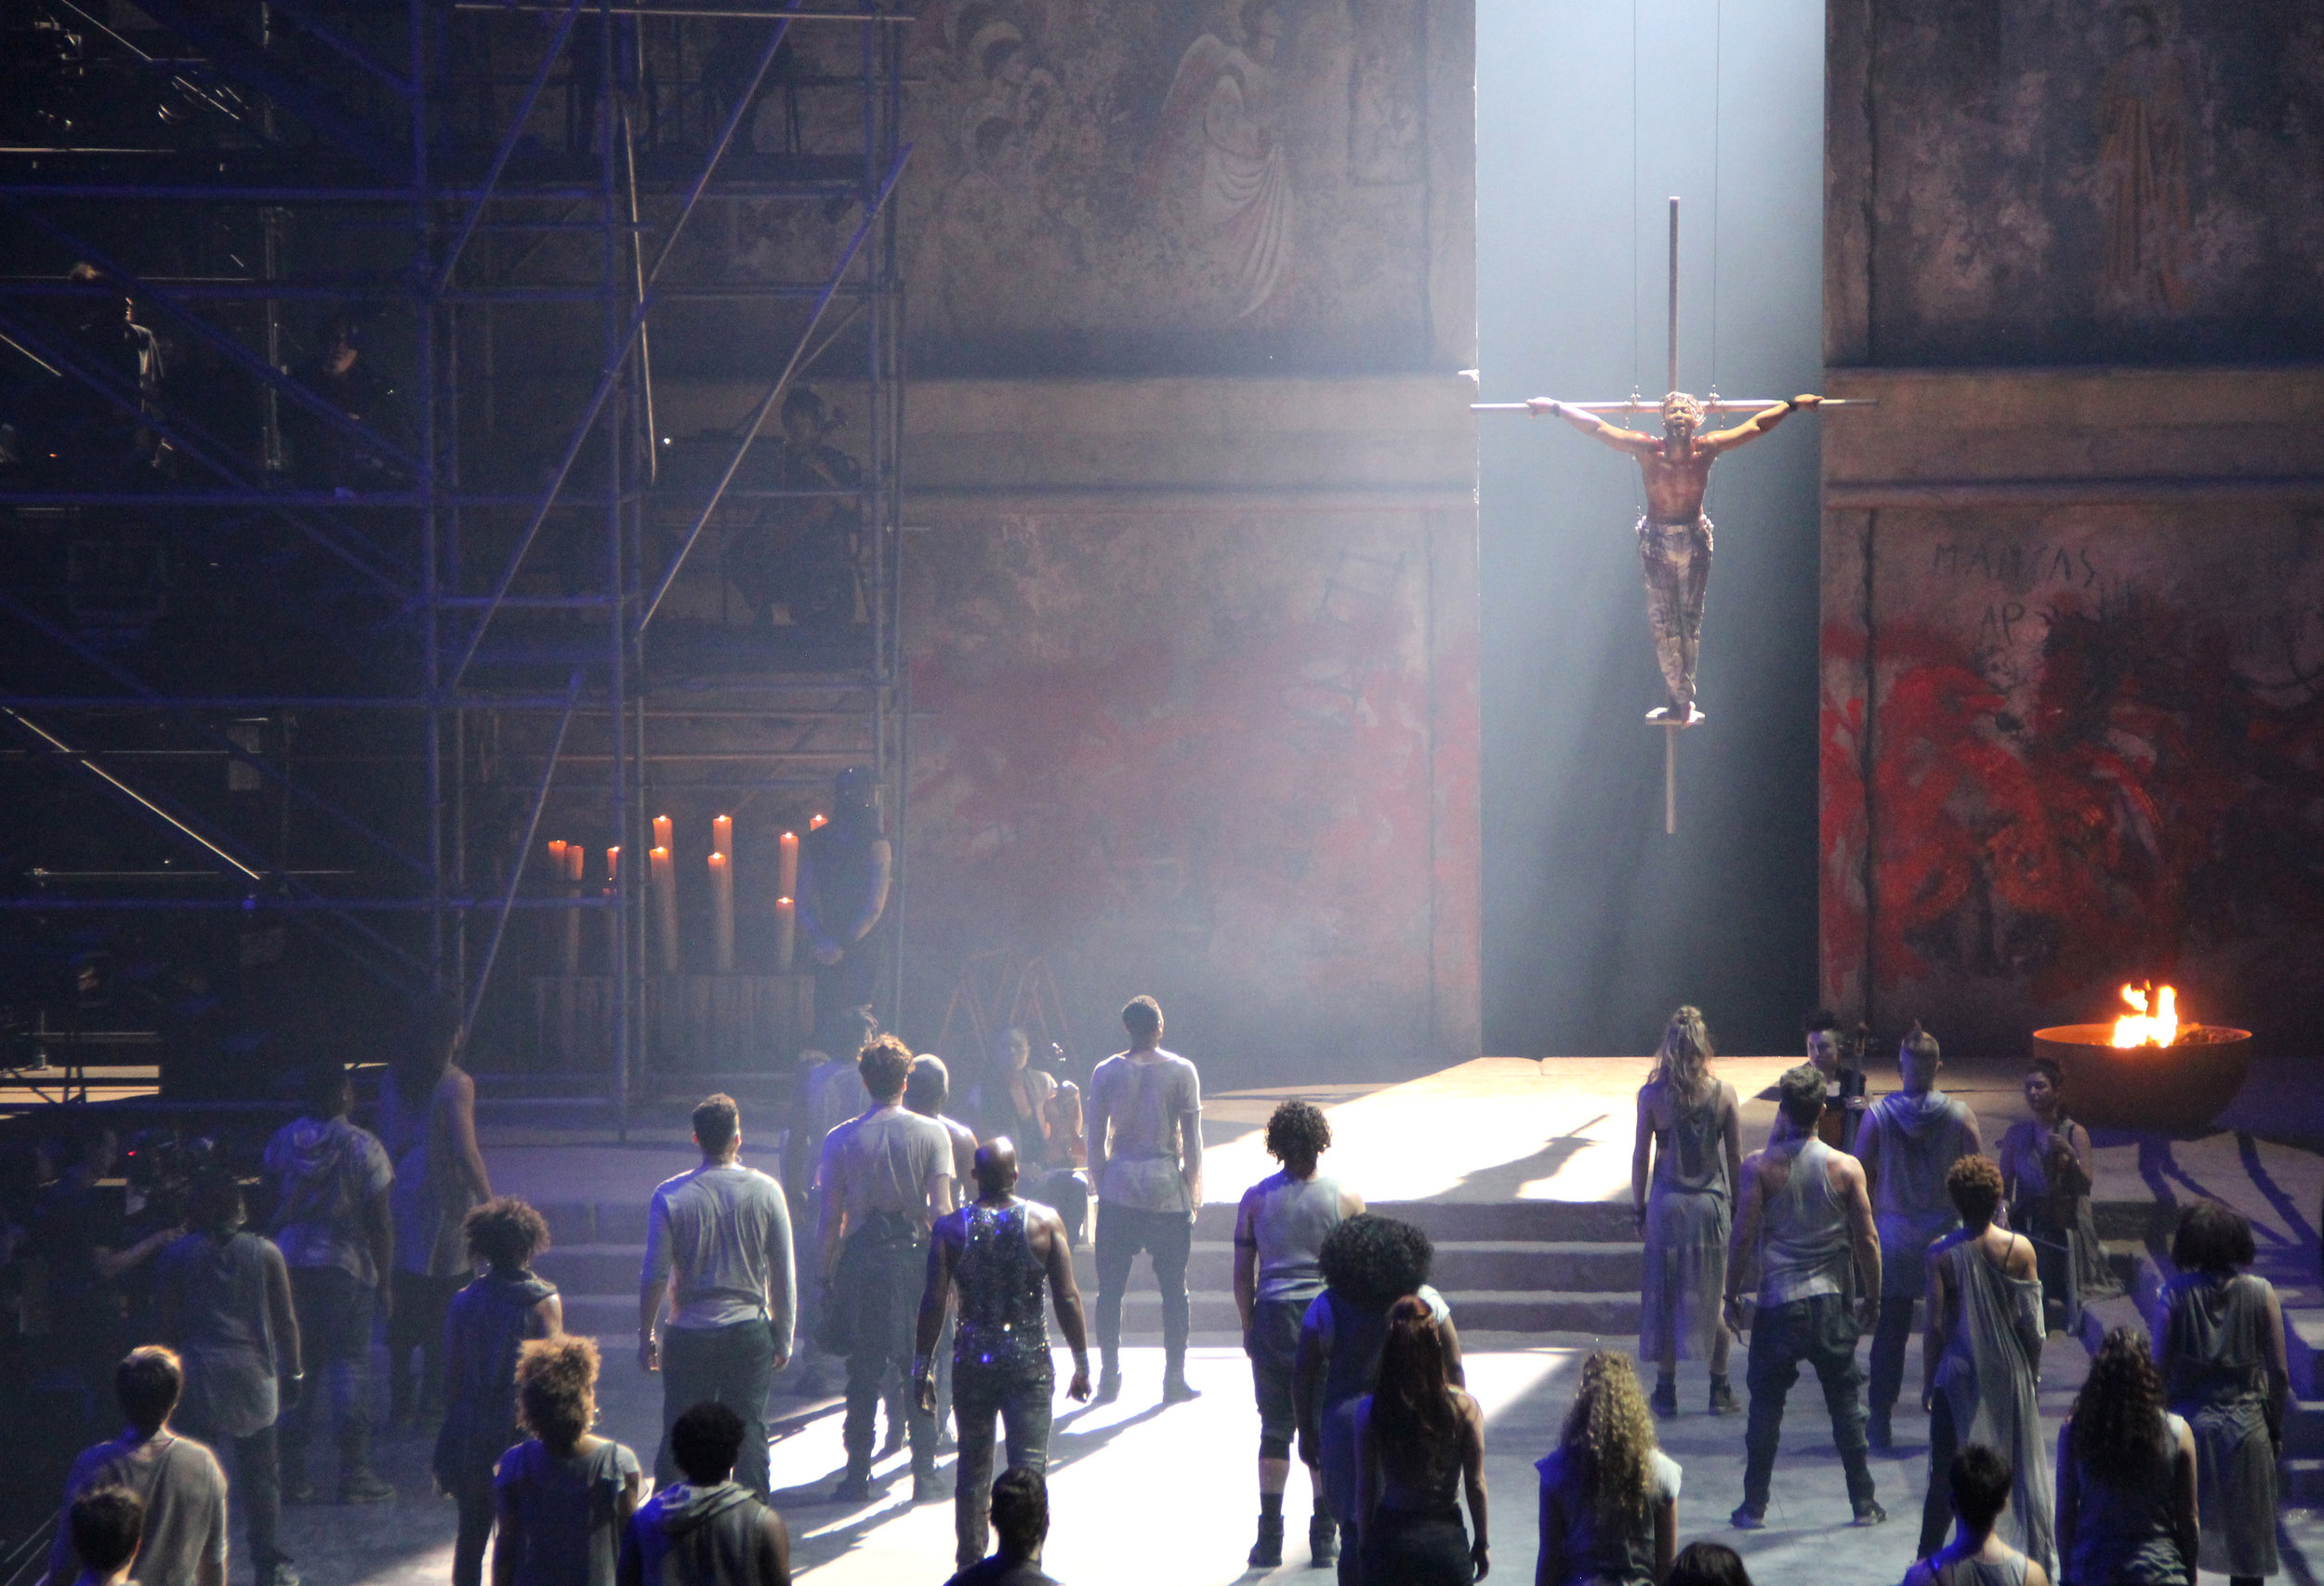 Jesus-Christ-Superstar-Act-10-Crucifixion-02.jpg